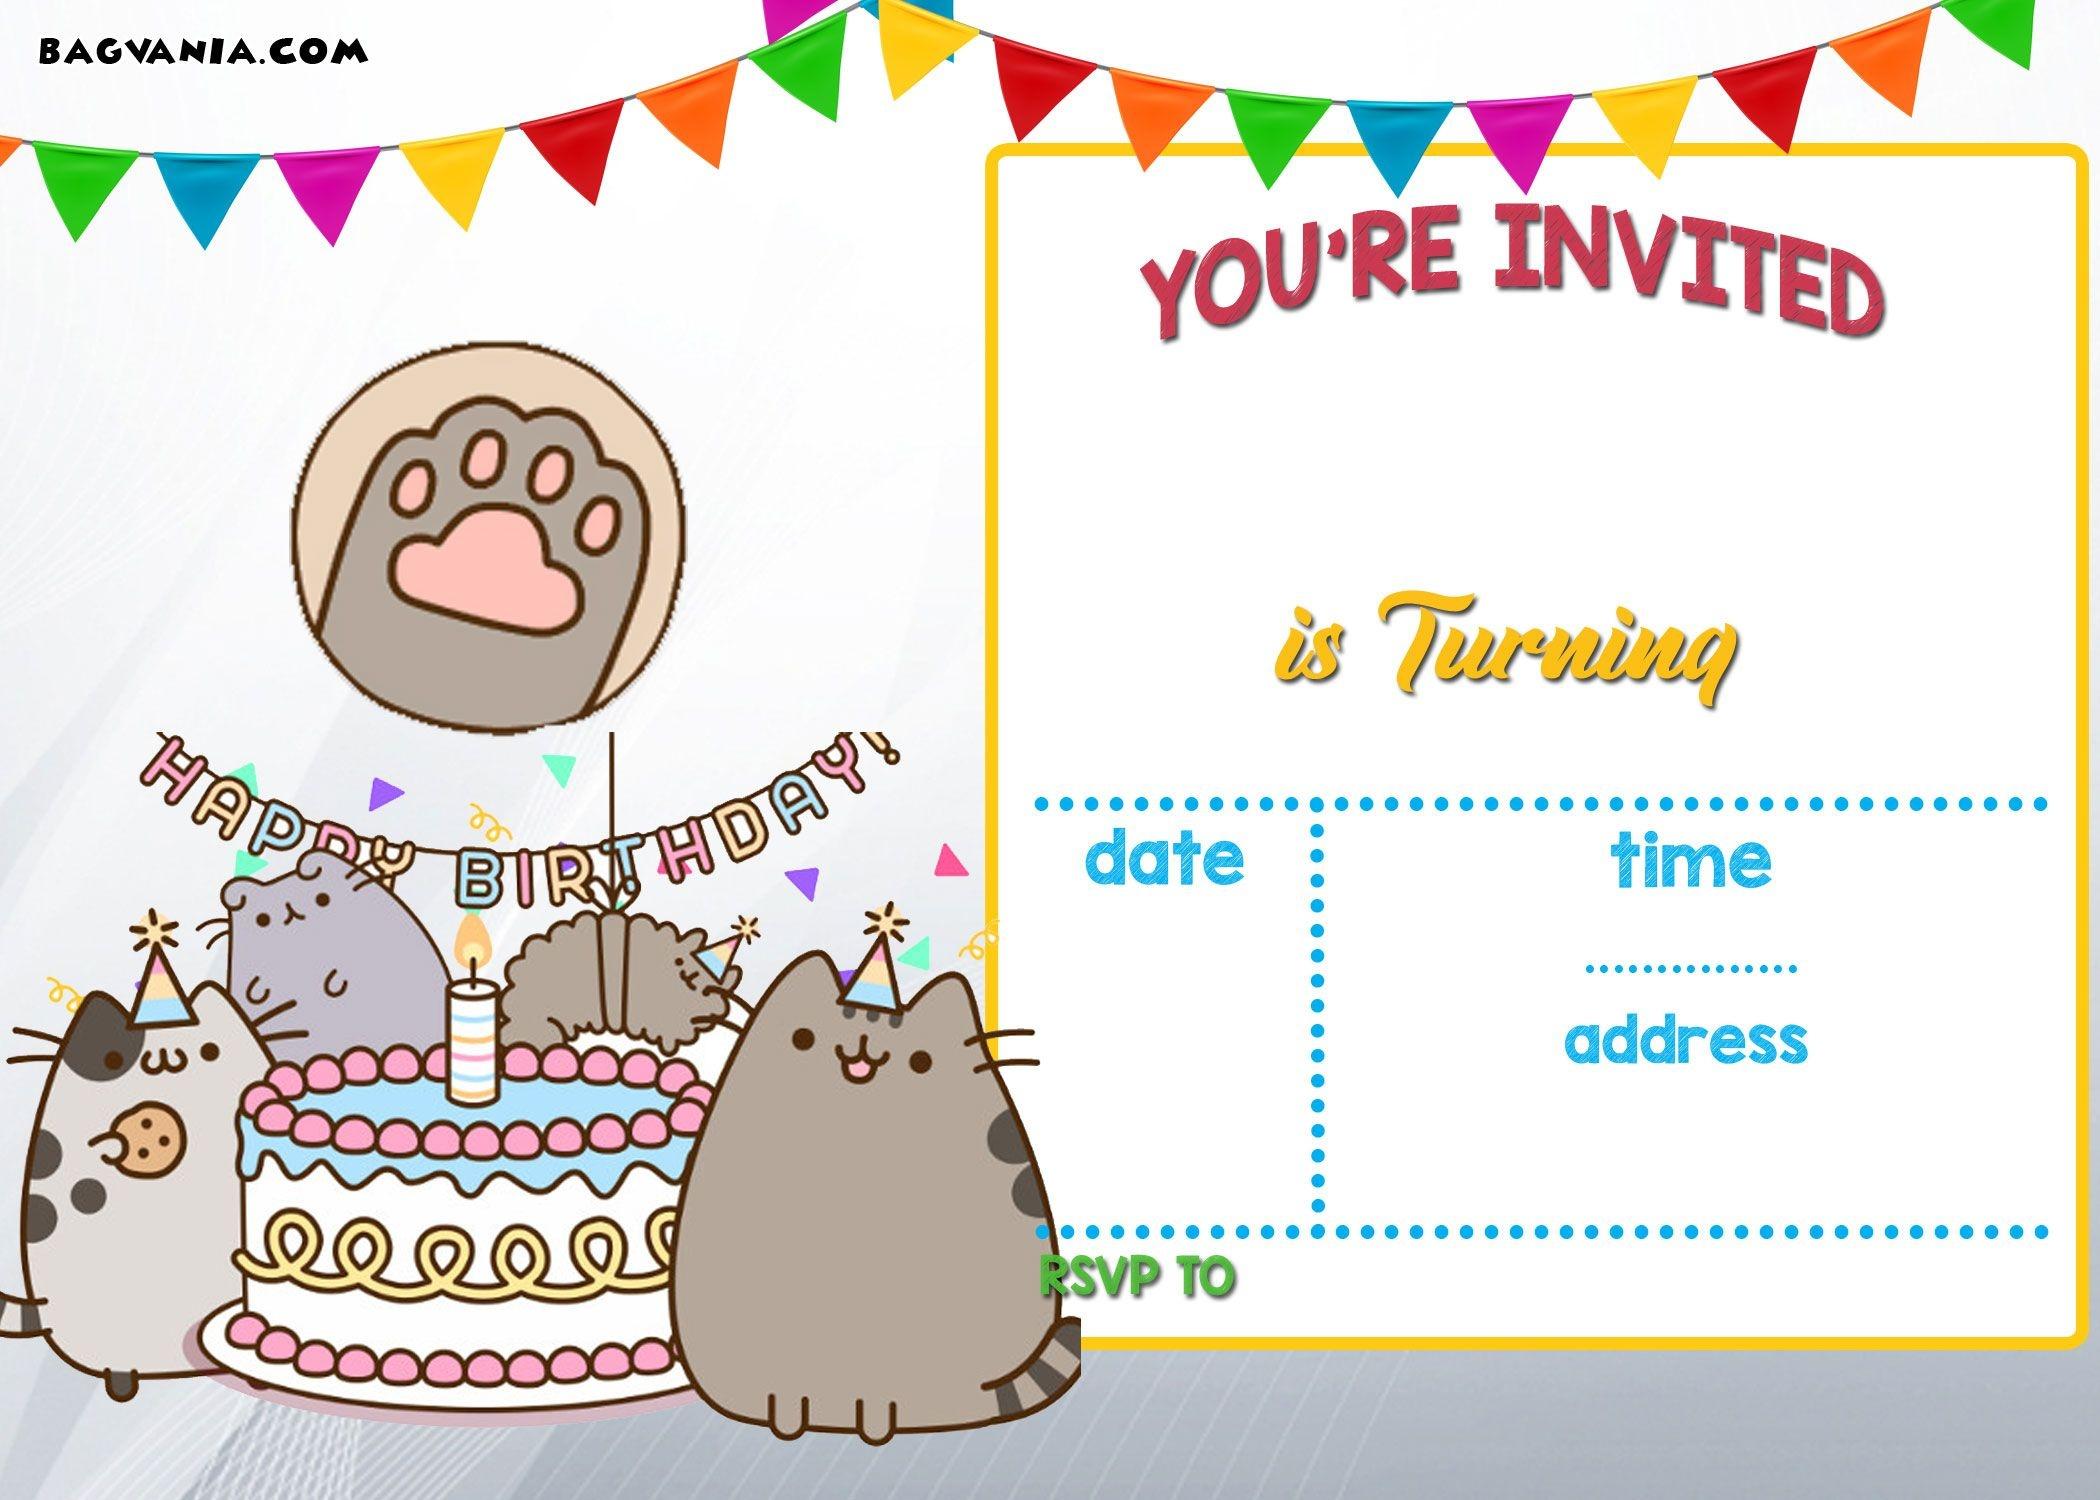 Free Printable Pusheen Birthday Invitation | Free Printable - Free Printable Kitten Birthday Invitations